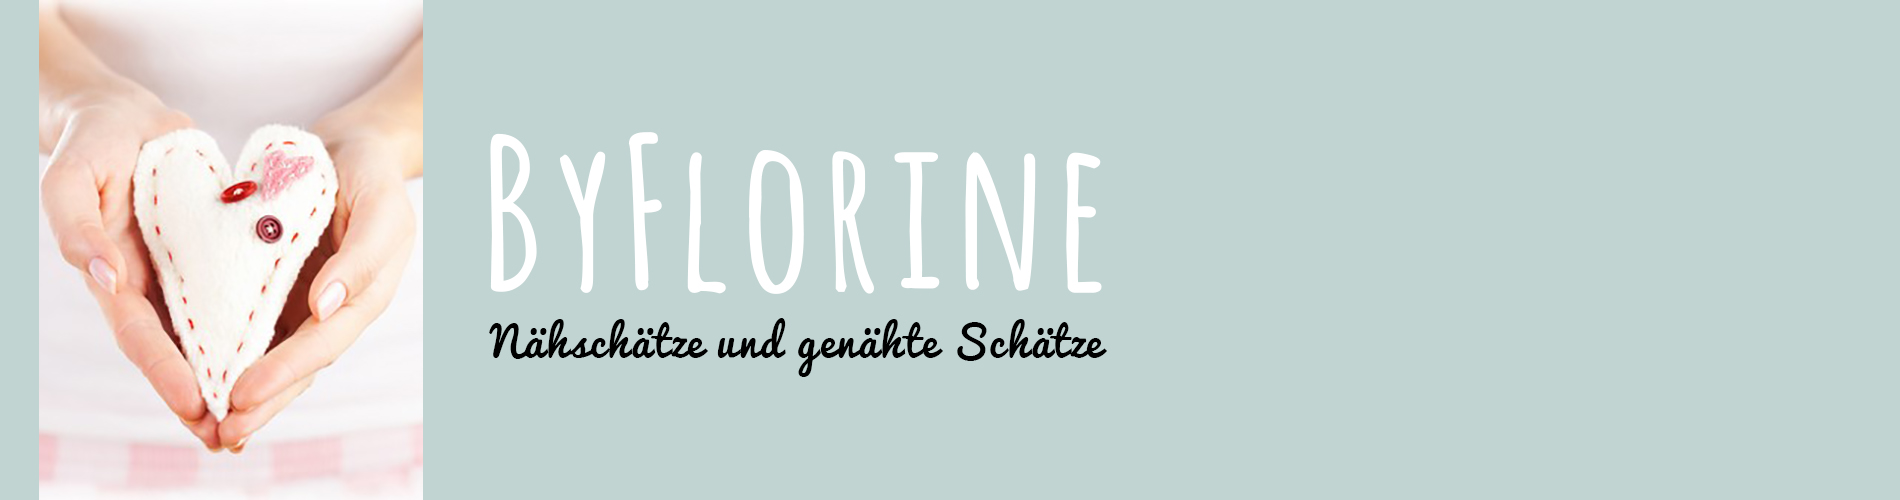 byFlorine-Logo